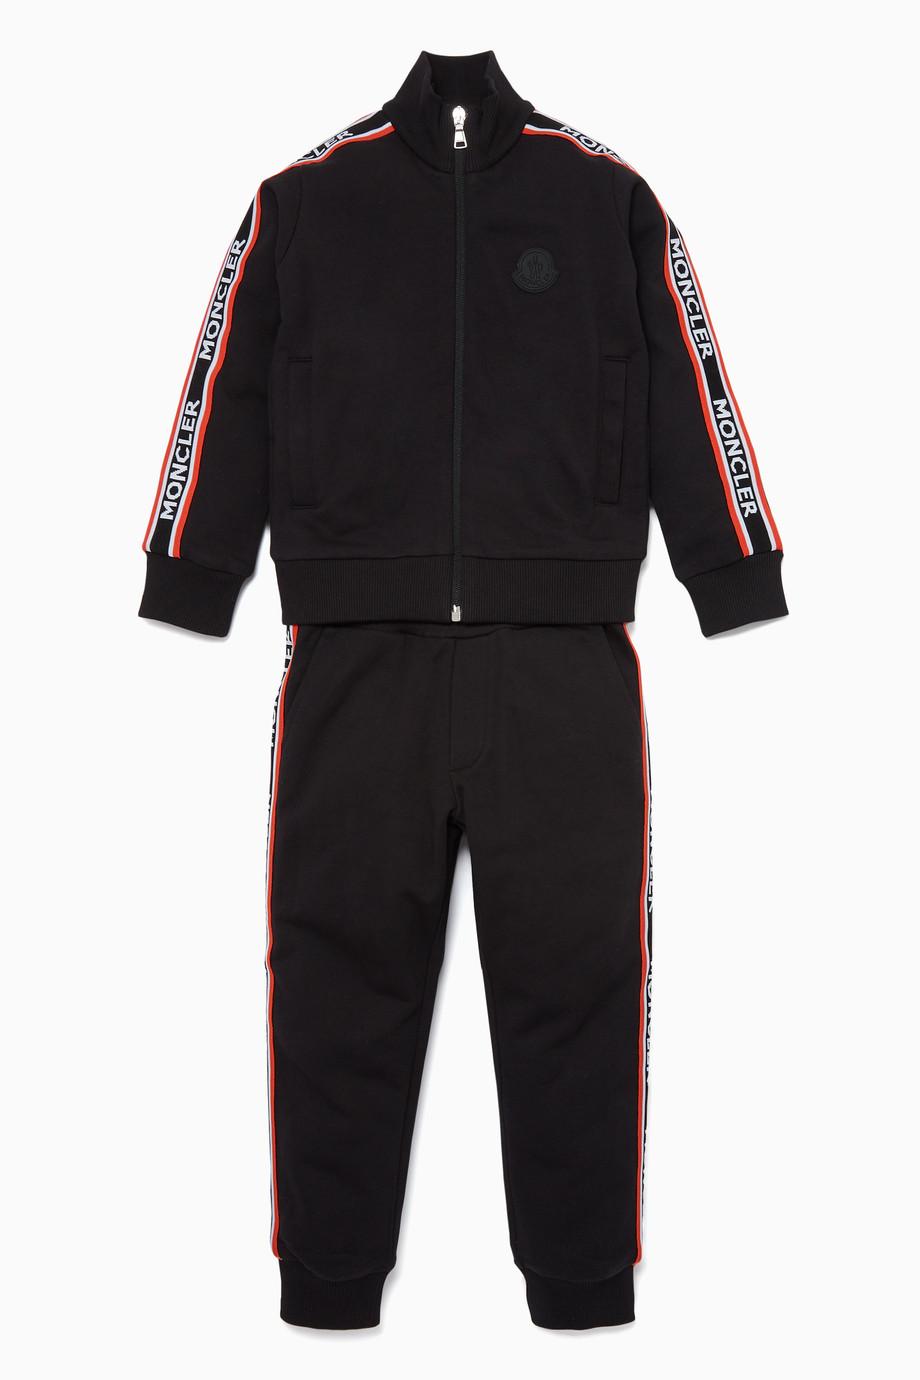 39d4f810e تسوق طقم بدلة رياضية بشريط بشعار الماركة Moncler أسود للأطفال ...